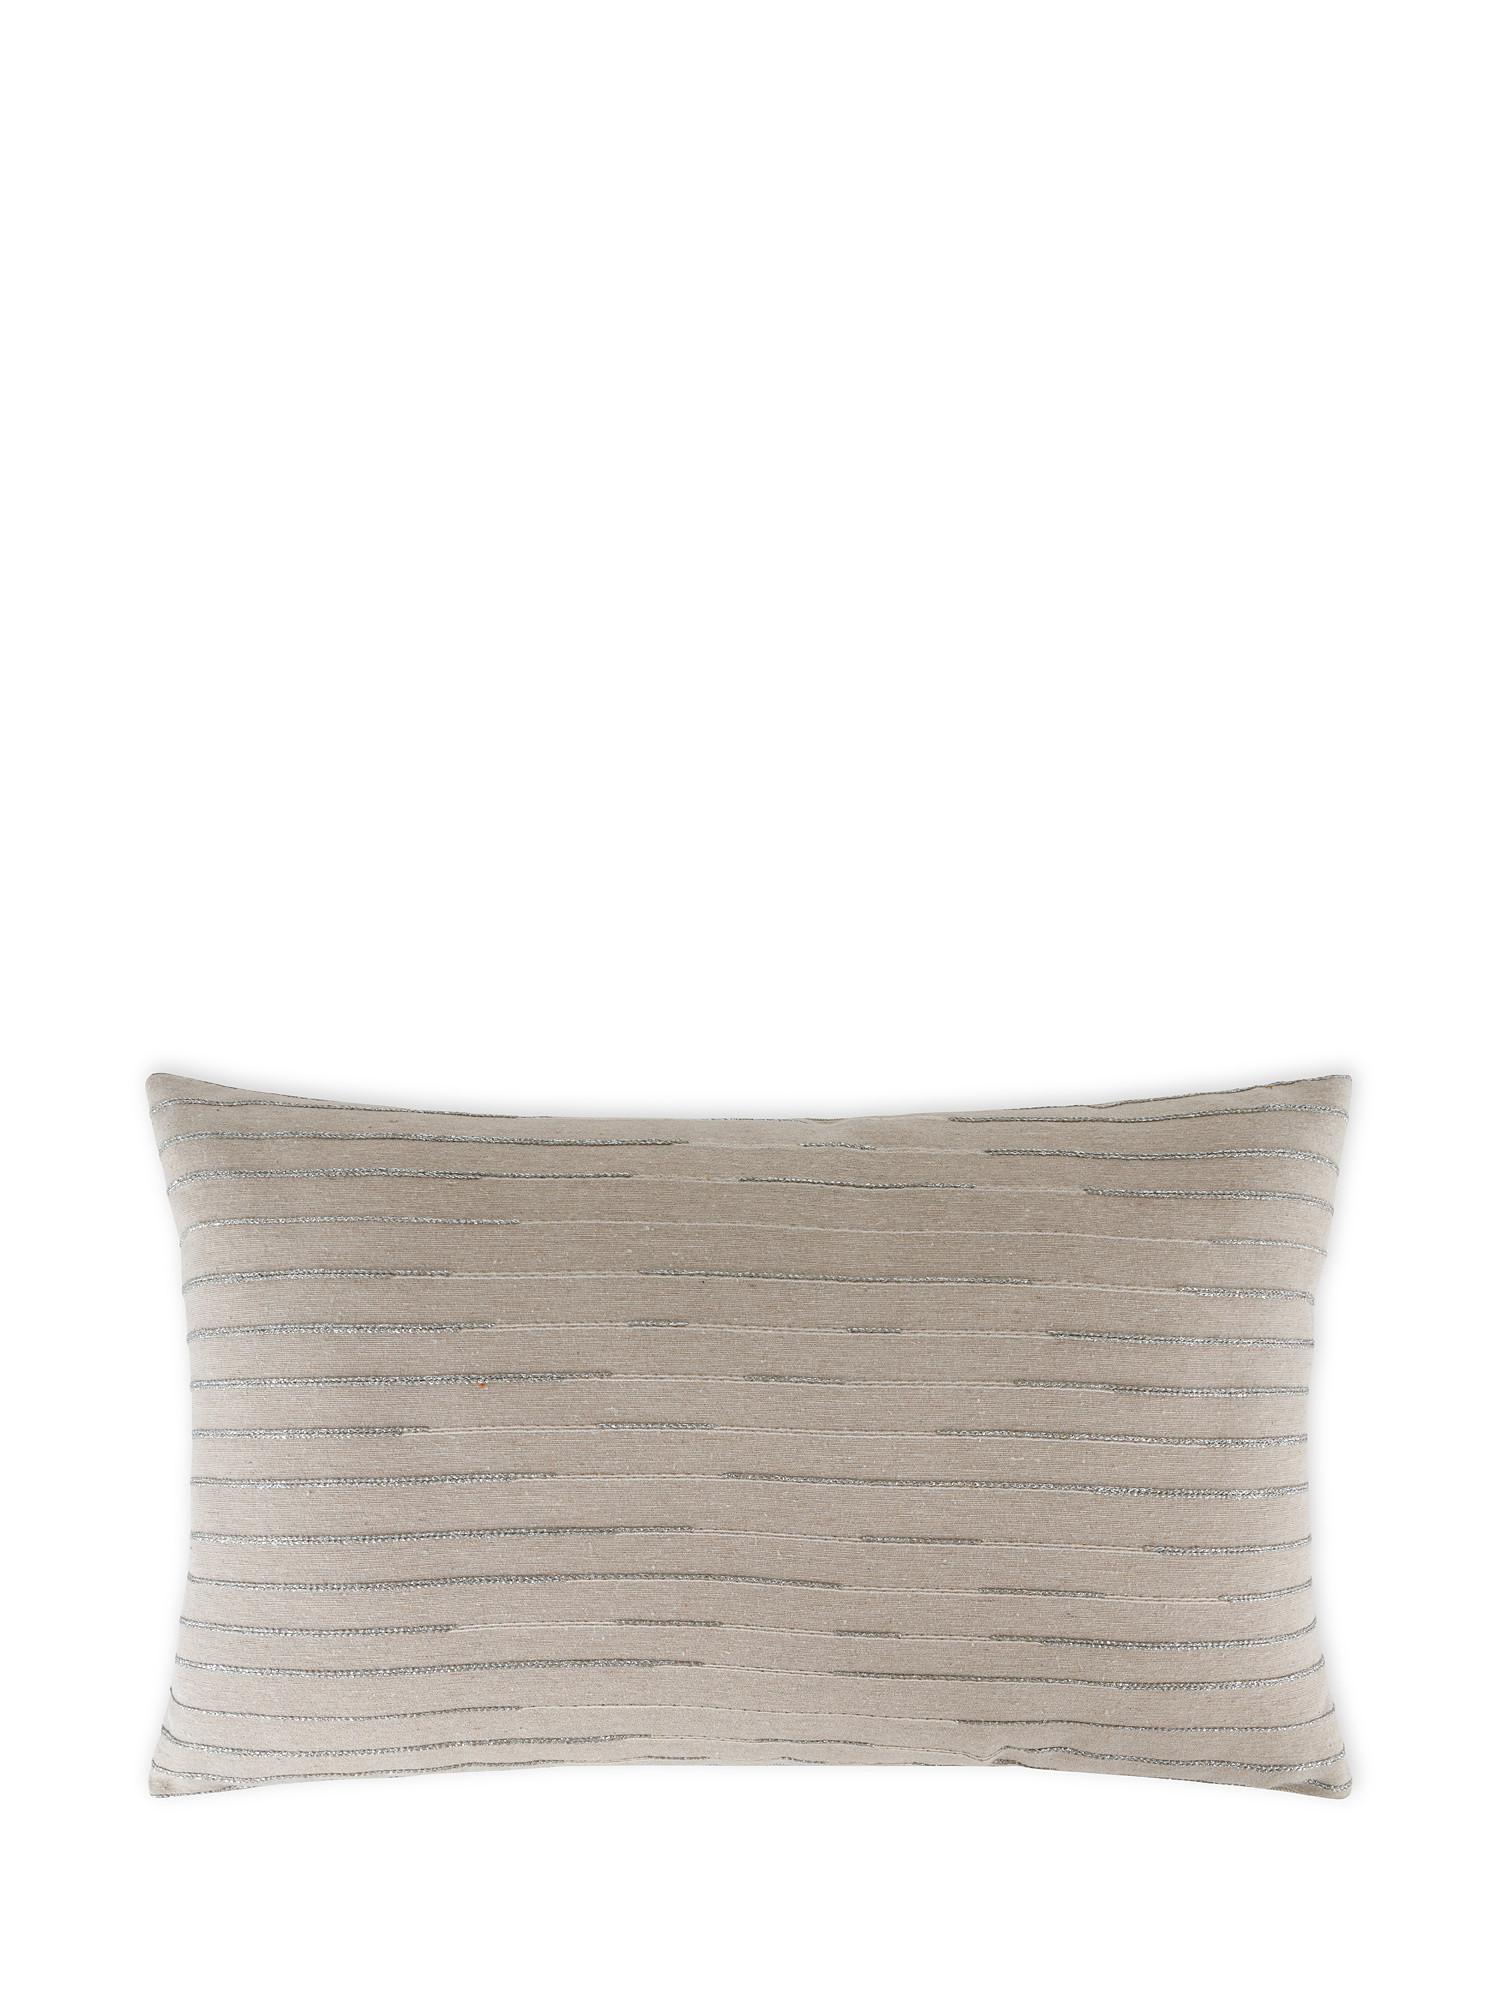 Cuscino tessuto jacquard lurex 35x55cm, Multicolor, large image number 0